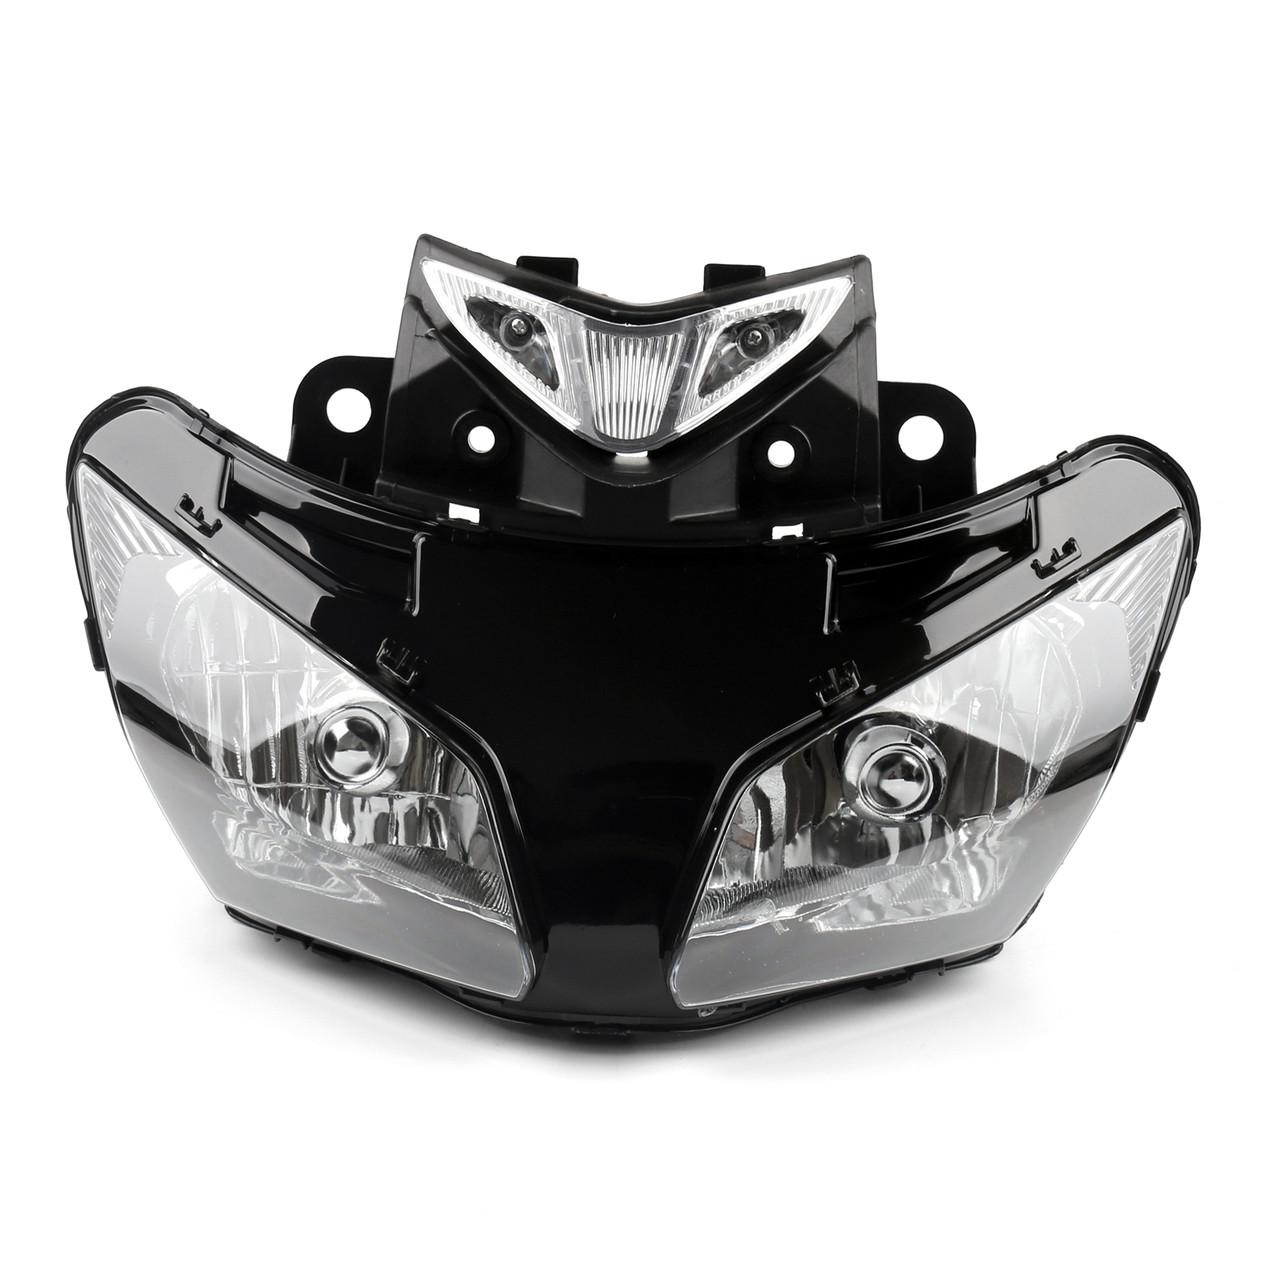 Headlight Assembly Headlamp Honda CBR500RR (2013-2015) Clear